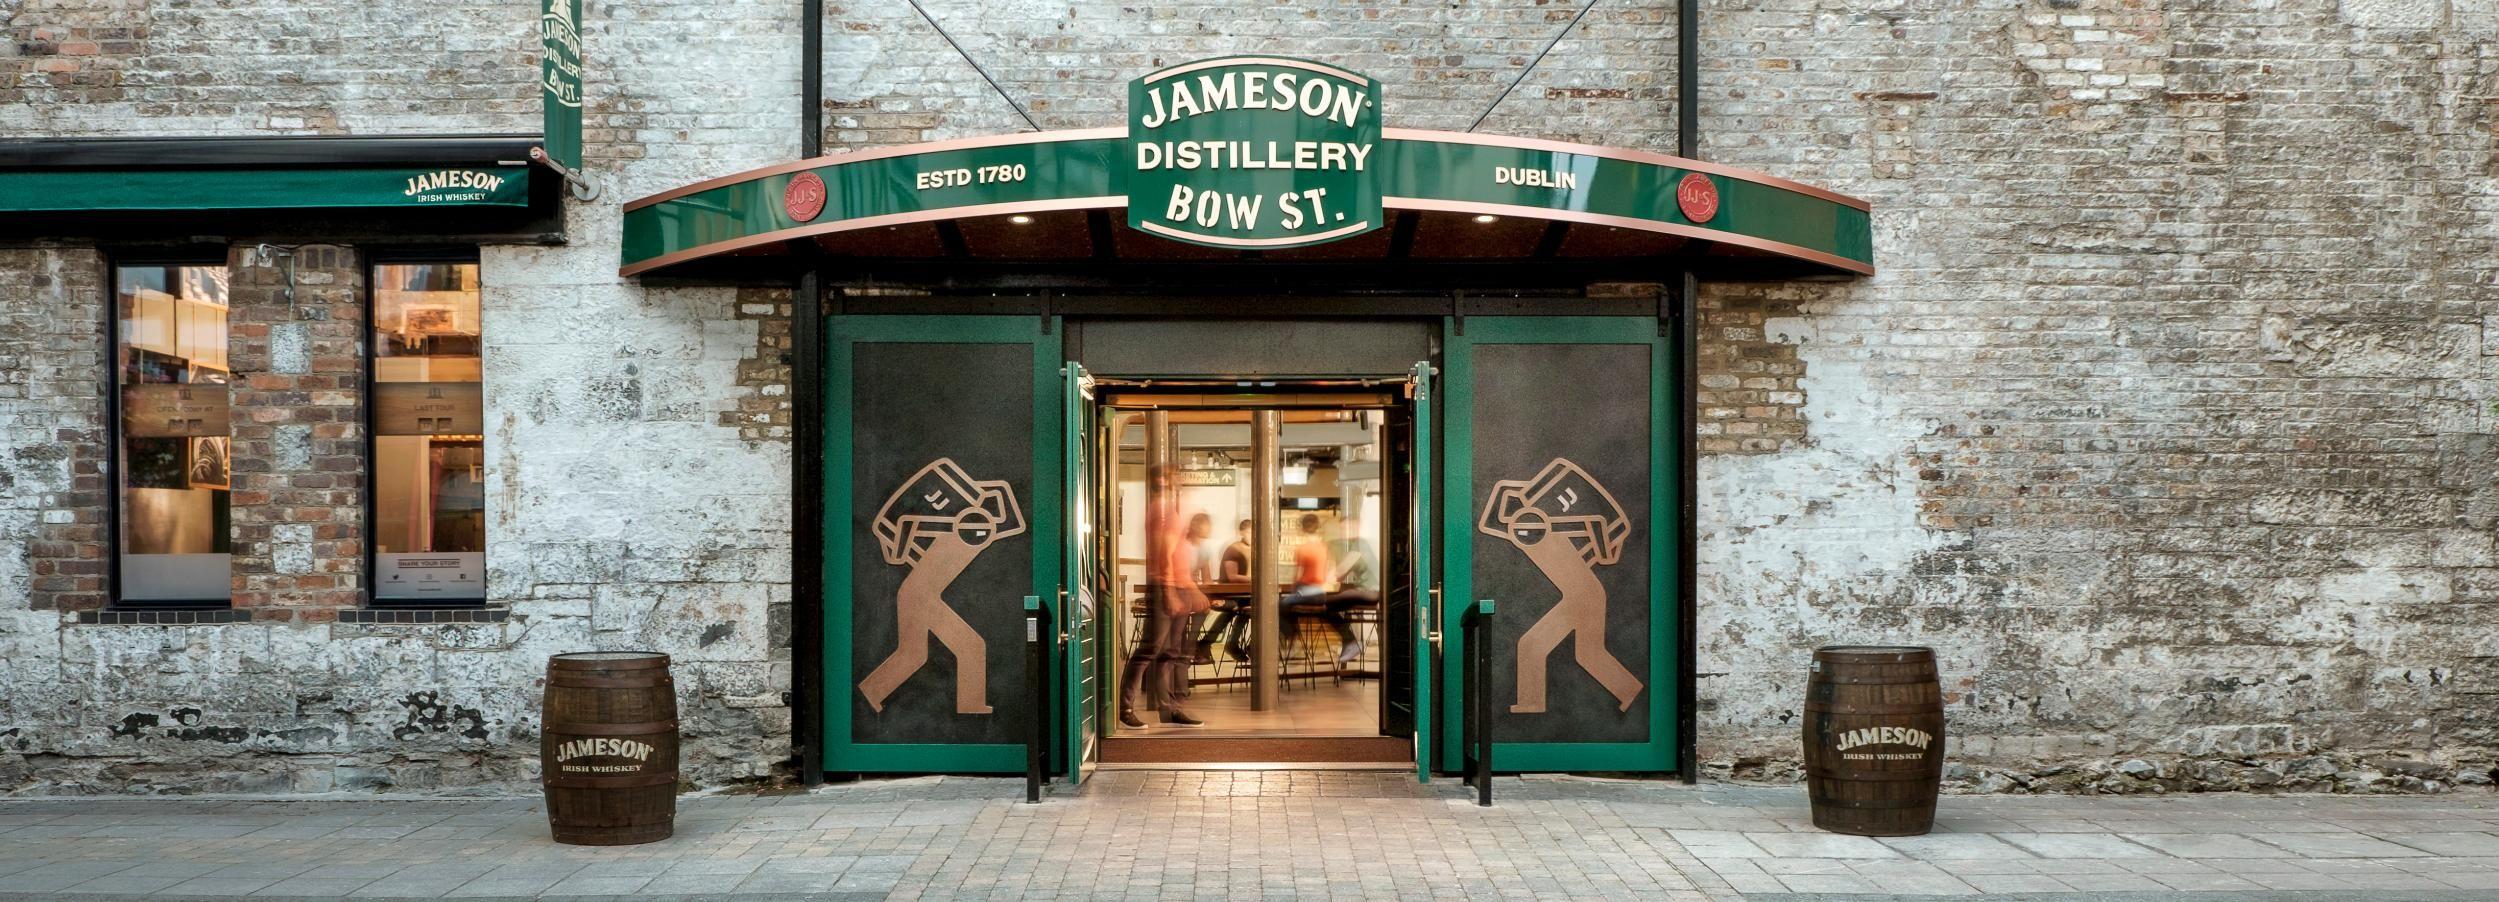 The Dublin Luxury Whiskey Trail